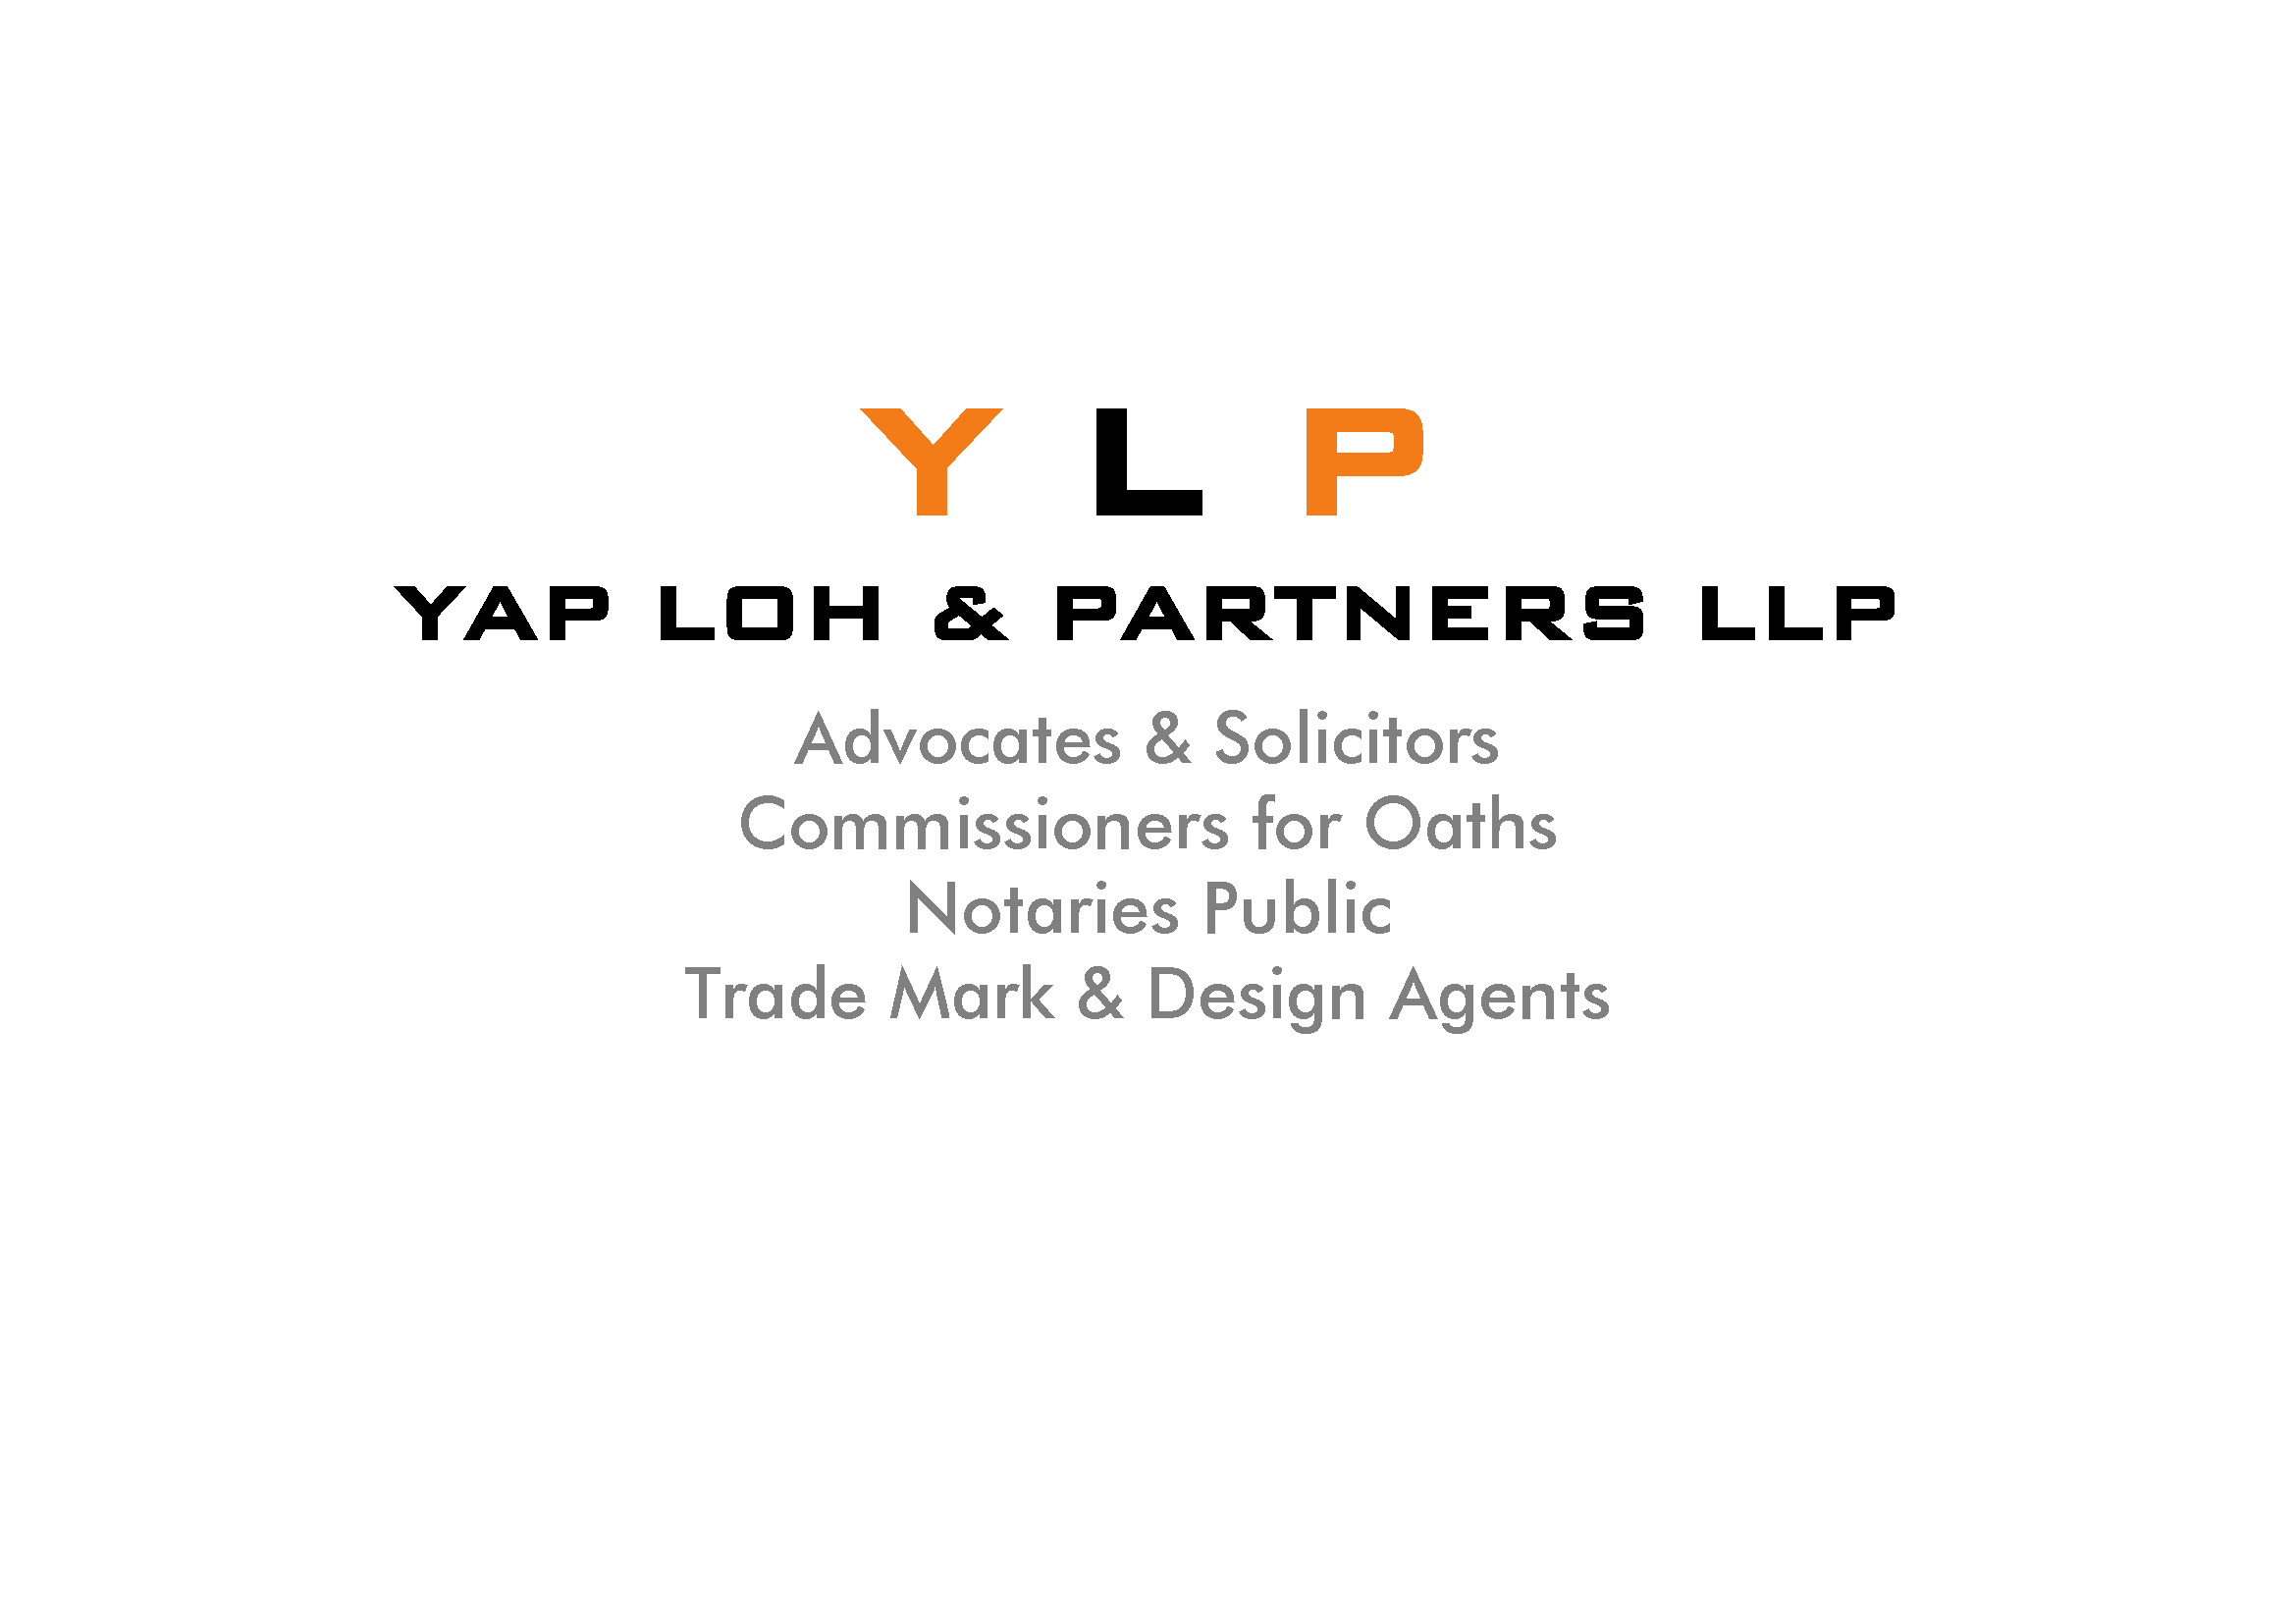 Yap Loh & Partners LLP